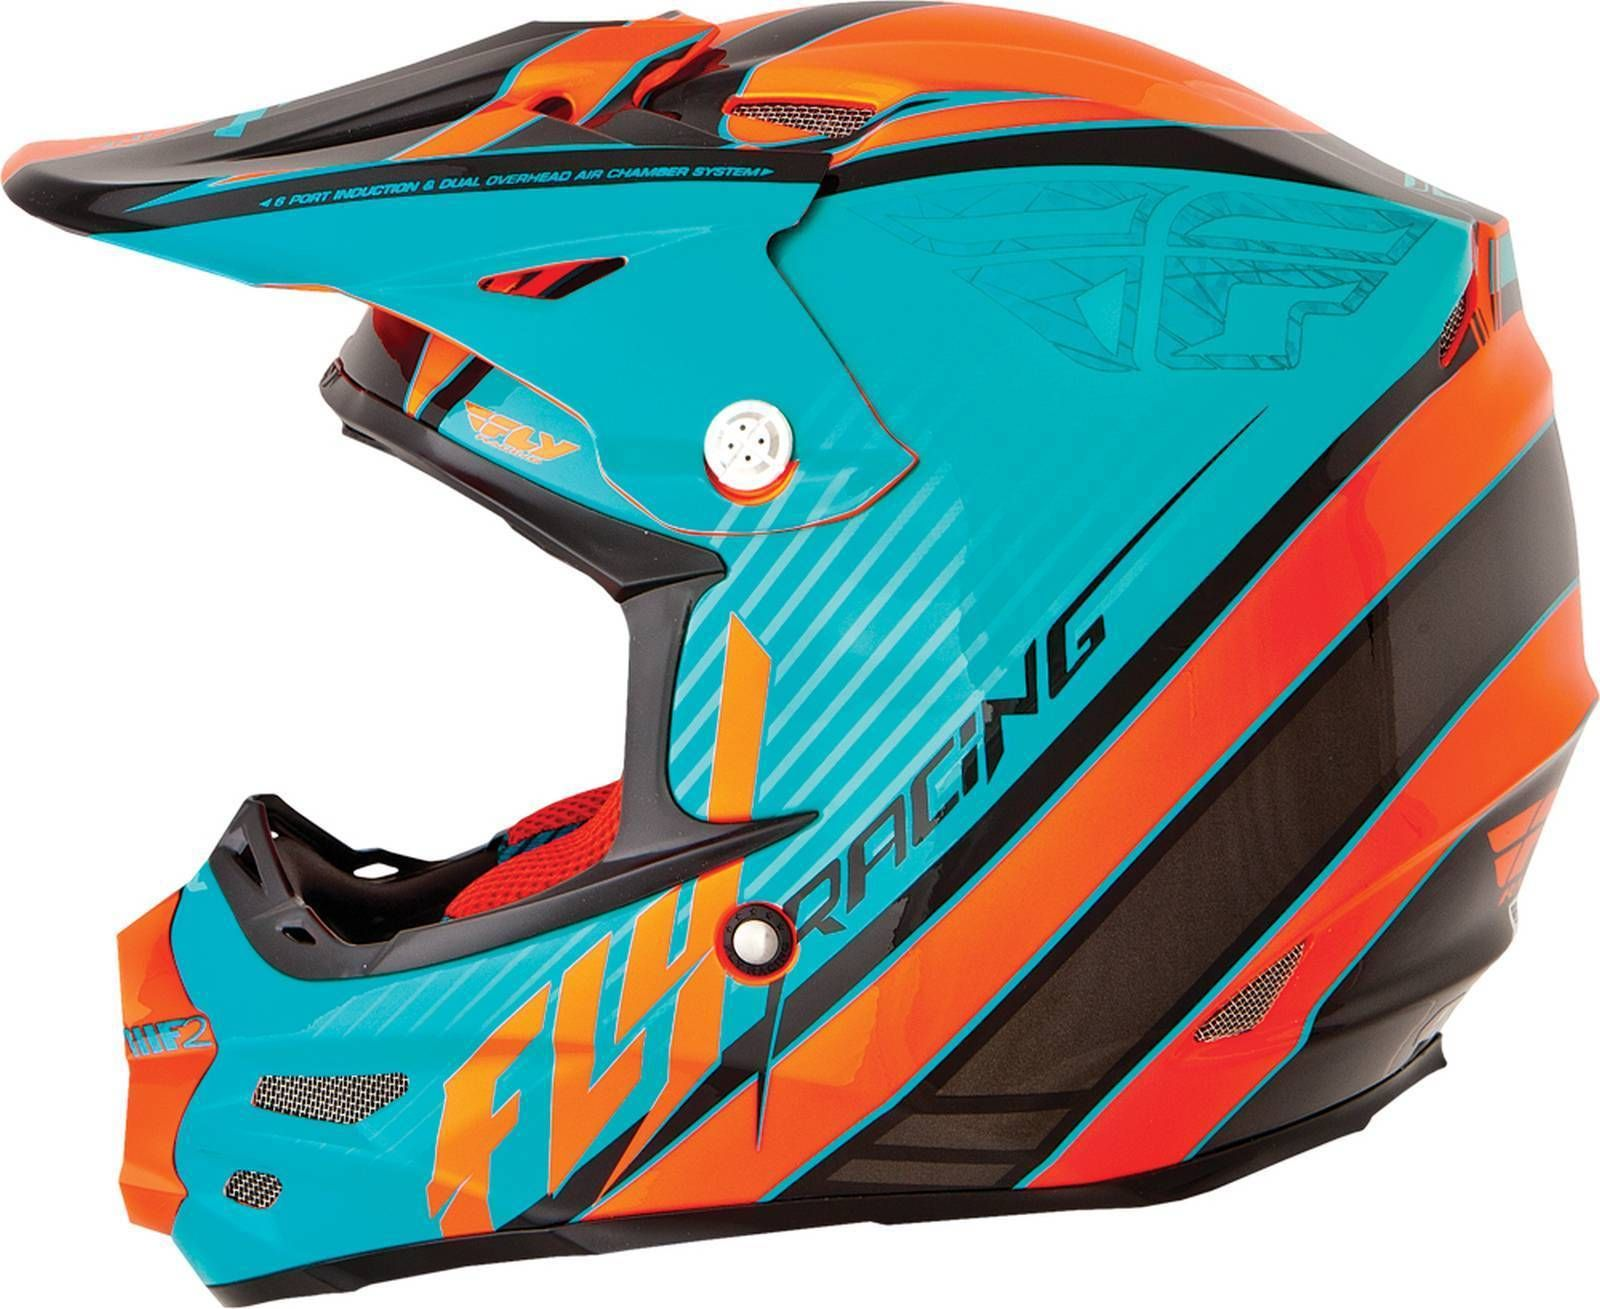 Fly Racing F2 Carbon Fastback Graphic Adult Helmet Teal Orange